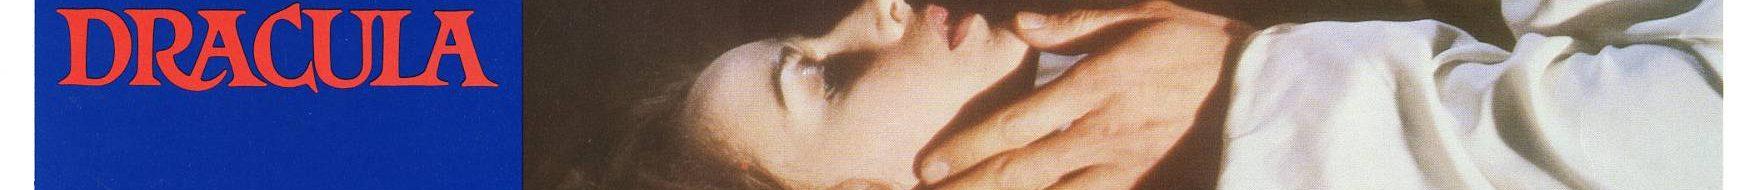 Cinemosity 136 – Dracula 1979